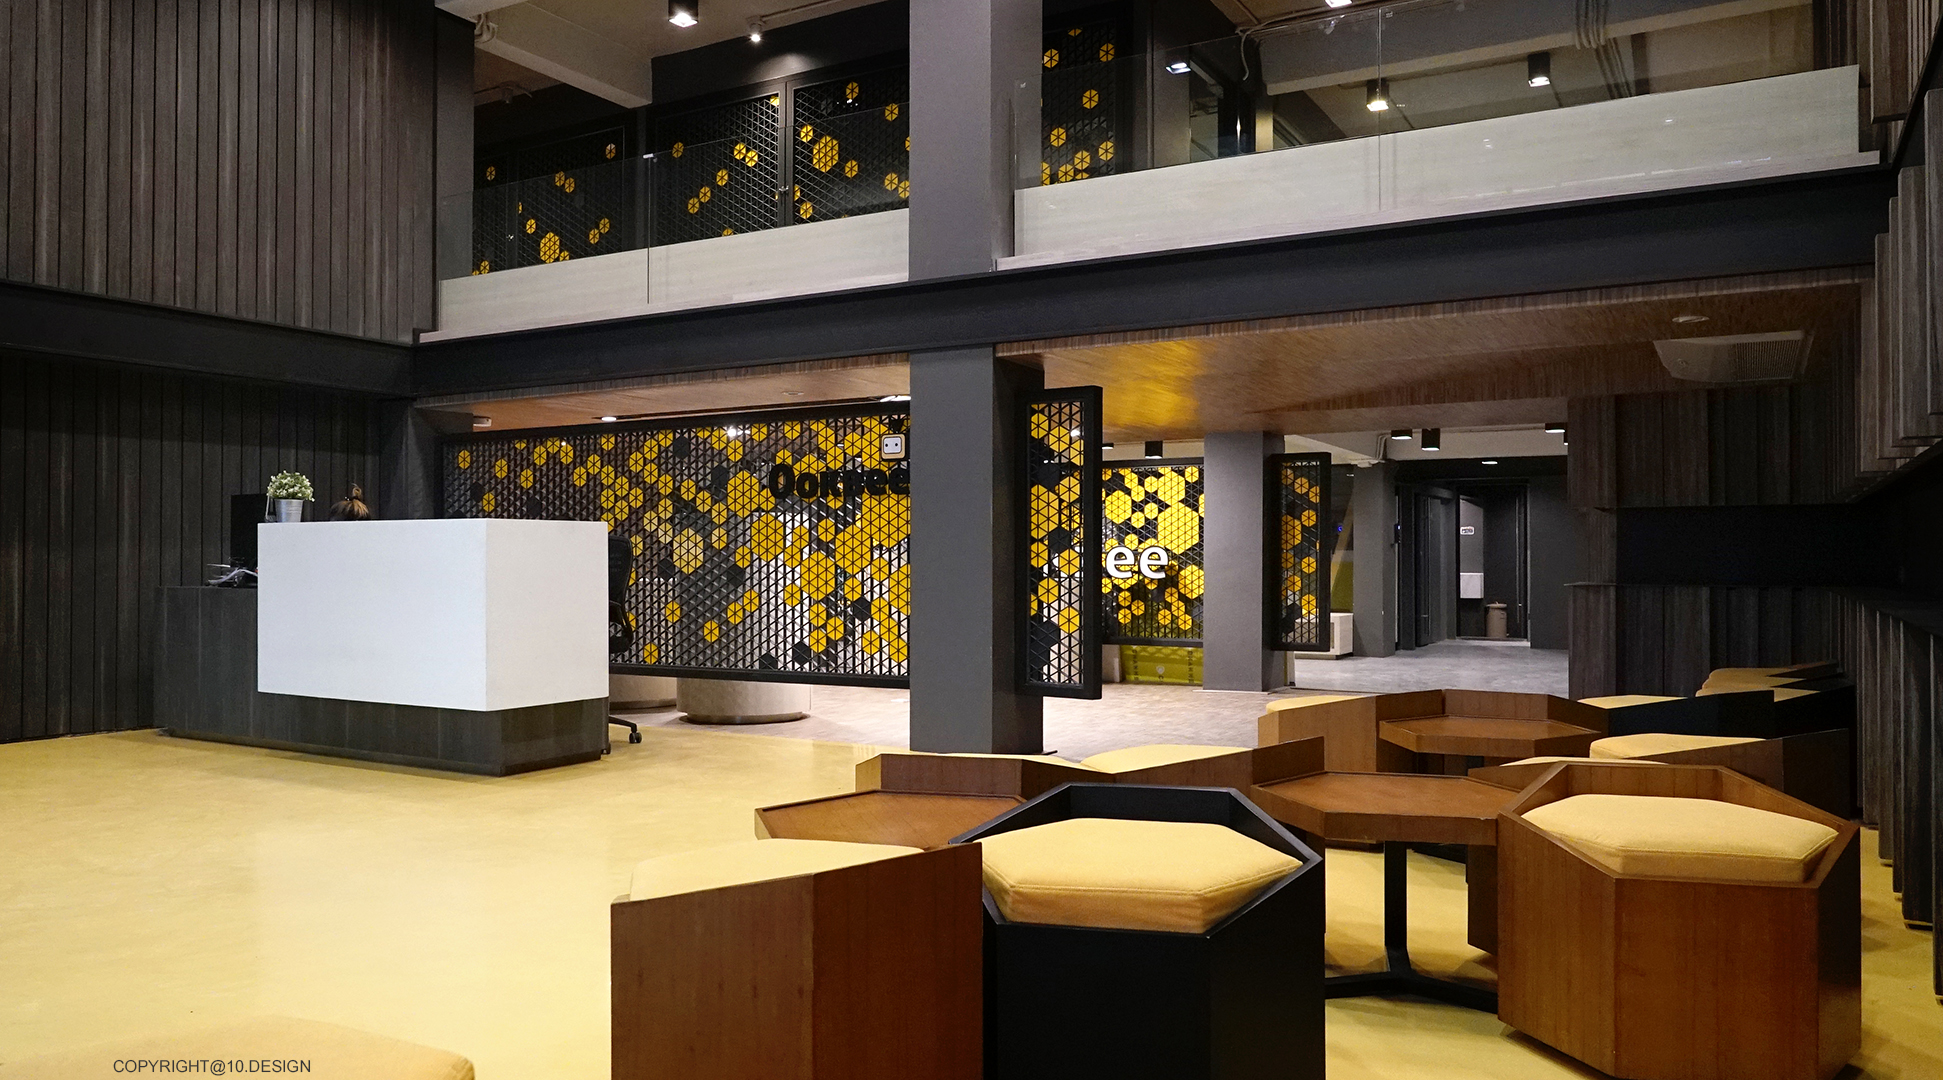 10DESIGN ookbee head office interior design start up 08